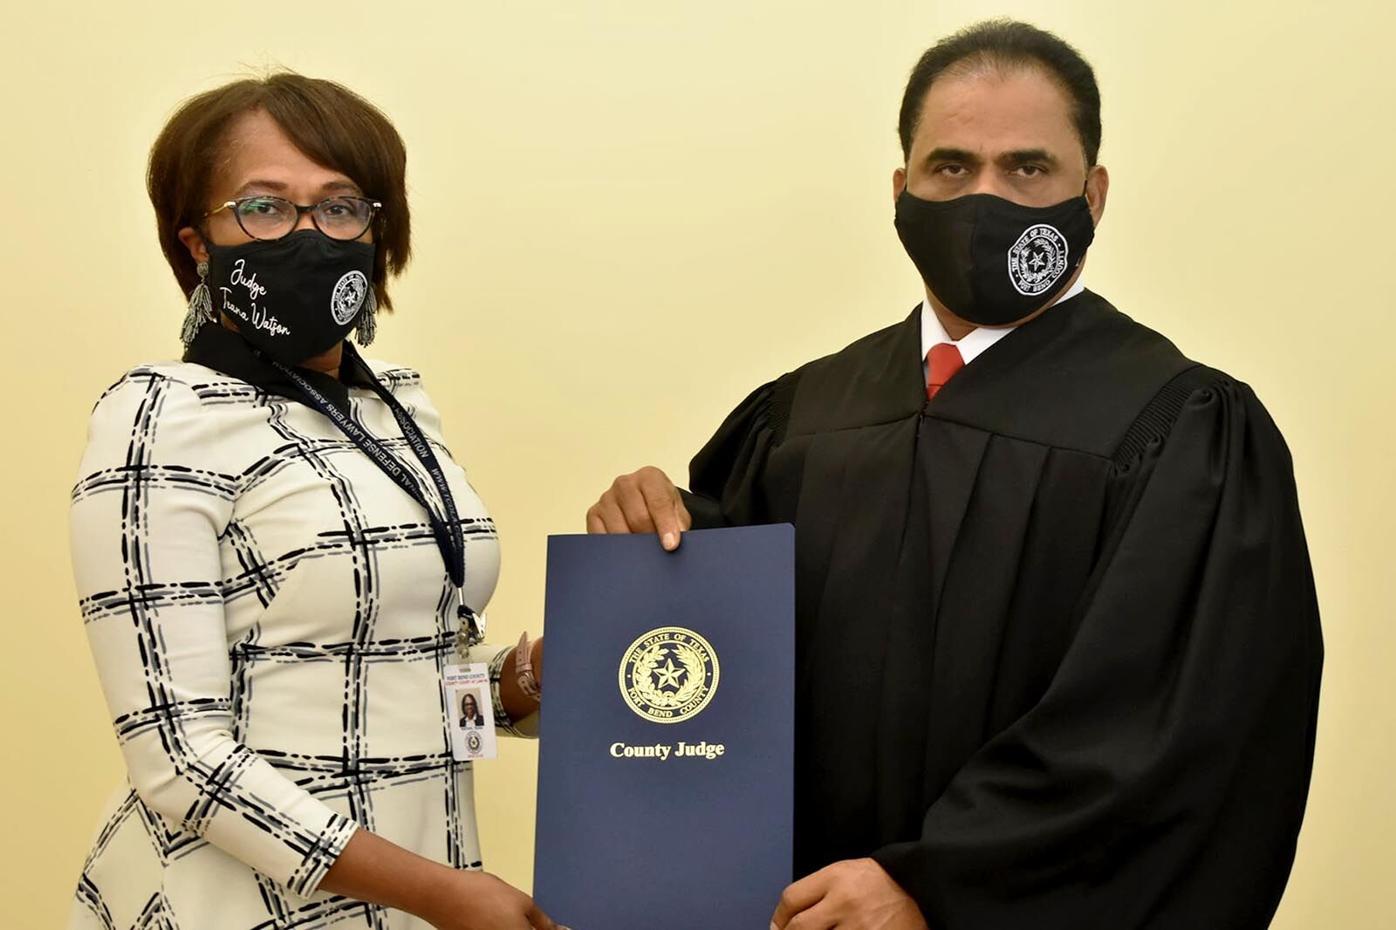 Judge KP George and Judge Teana Watson